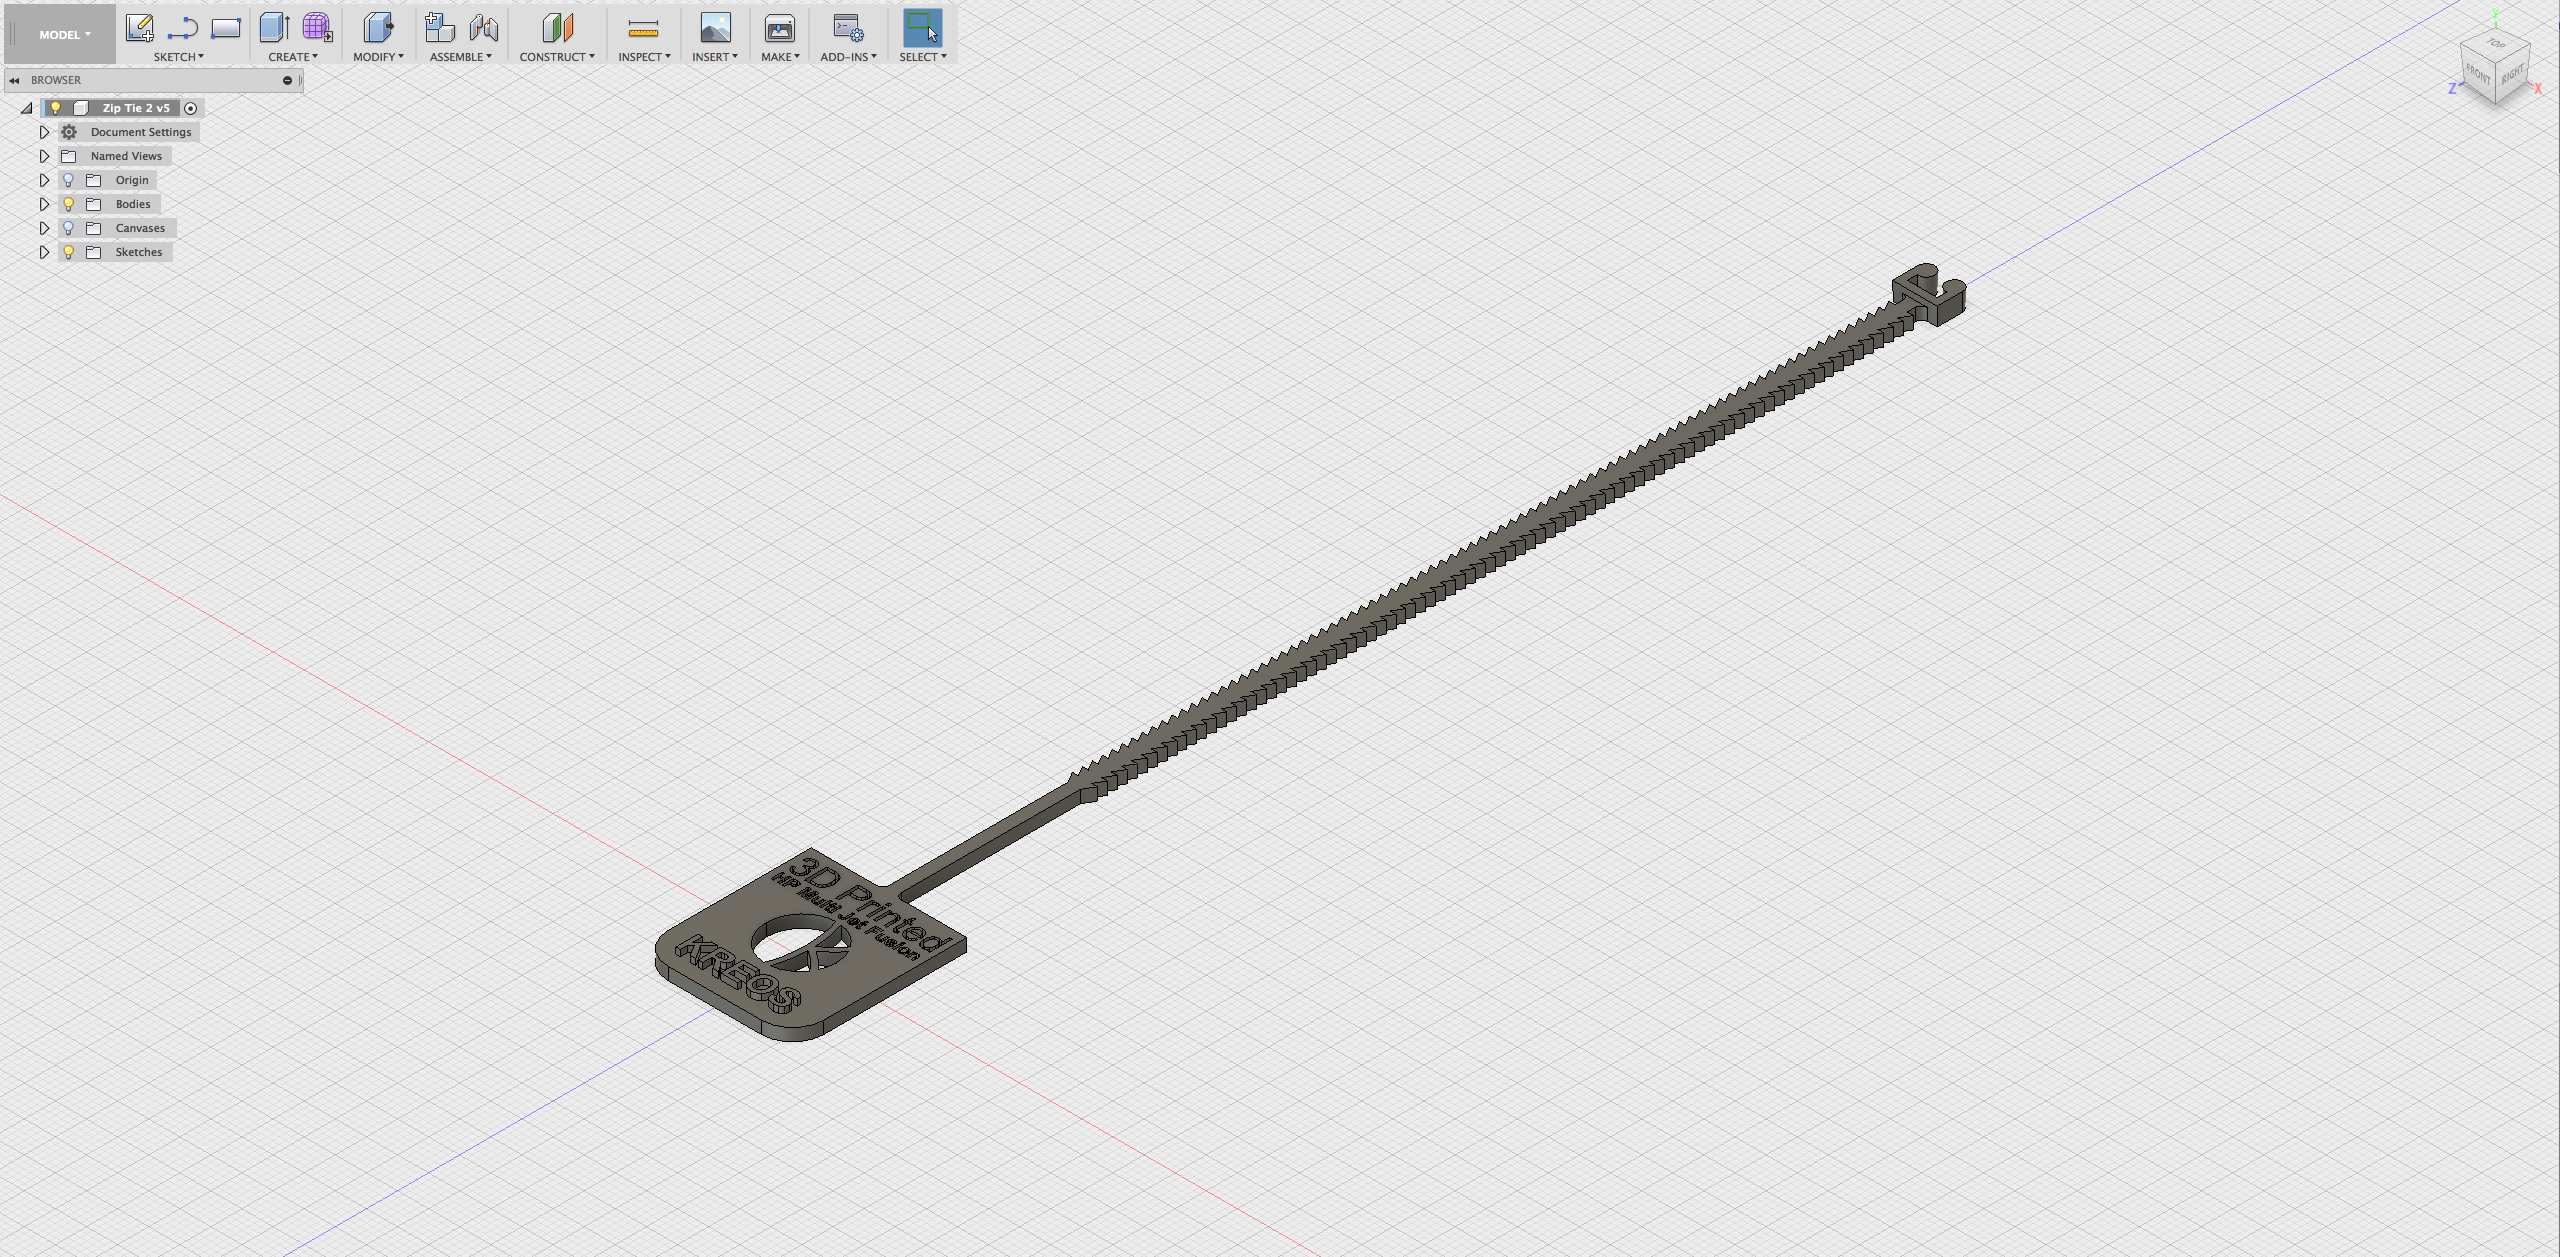 Capture d'écran 2017-12-06 à 16.26.11.png Download free STL file Serflex Clamp • Template to 3D print, F3DF